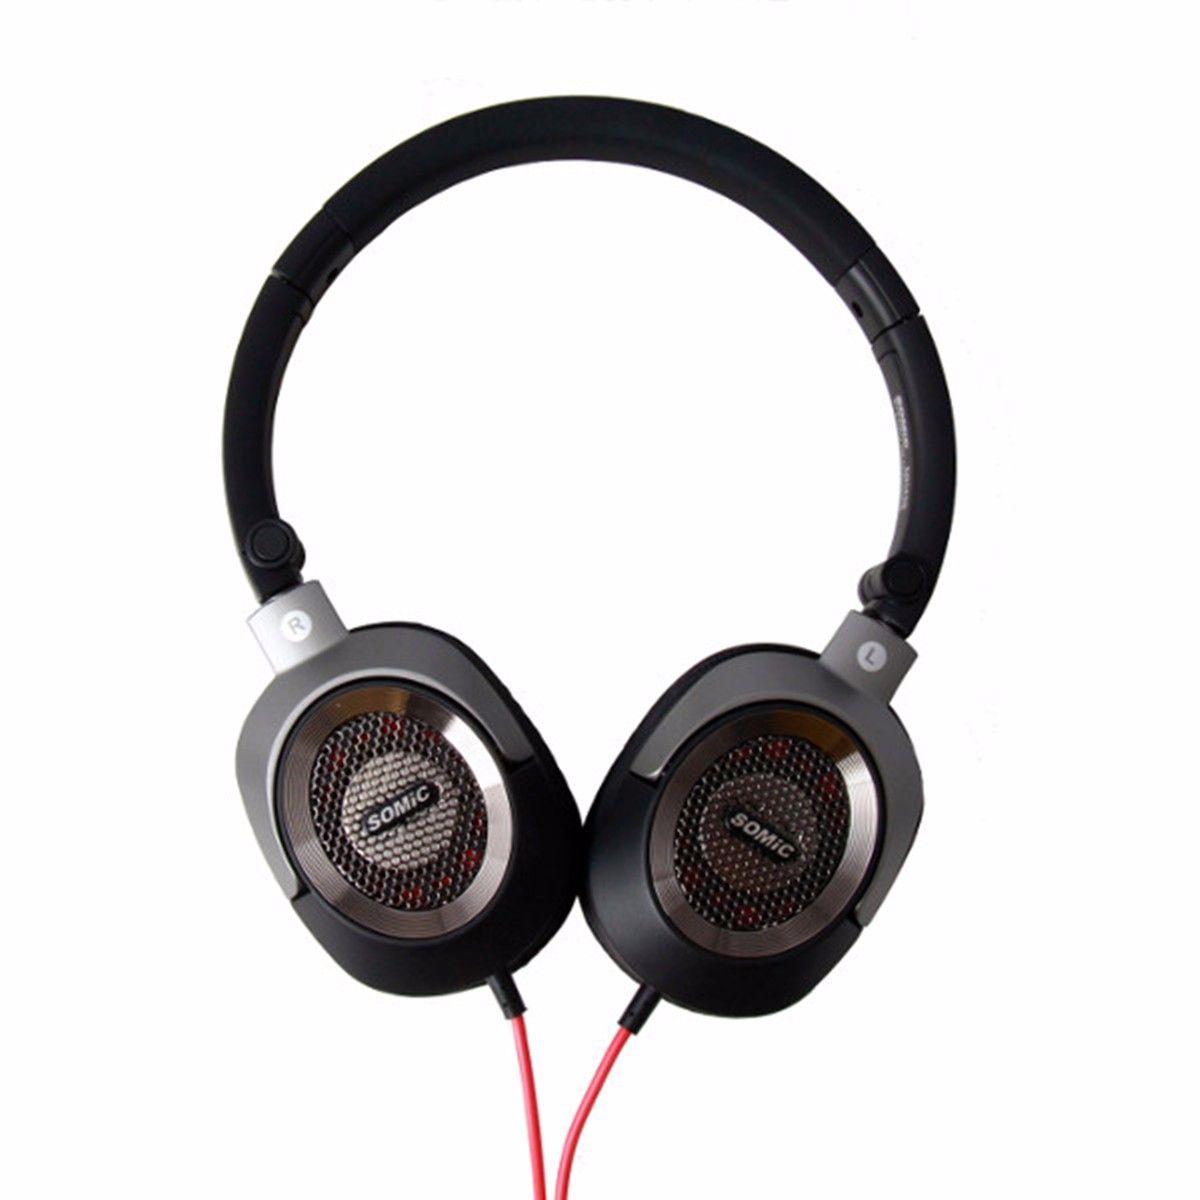 100 Original Somic Mh438 3 5mm Aux Stereo Headphone Headset With Mic Wired Head Mounted Music Pc Computer Headphone Shtekery Besprovodnye Naushniki Naushniki